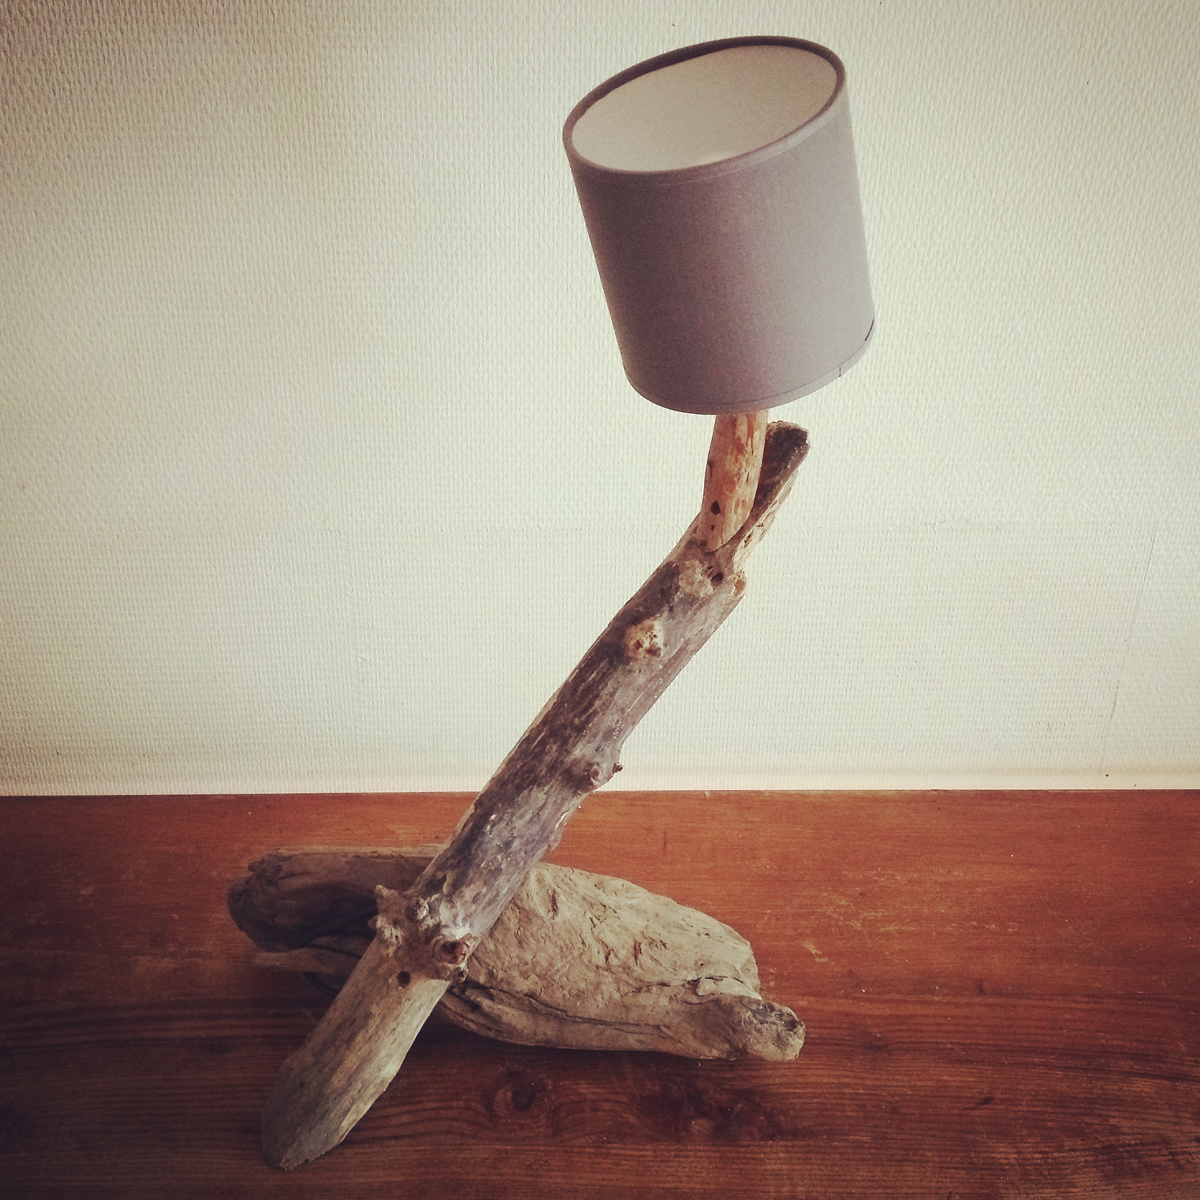 Lampe bois flotté - Art by Ze studio Annecy